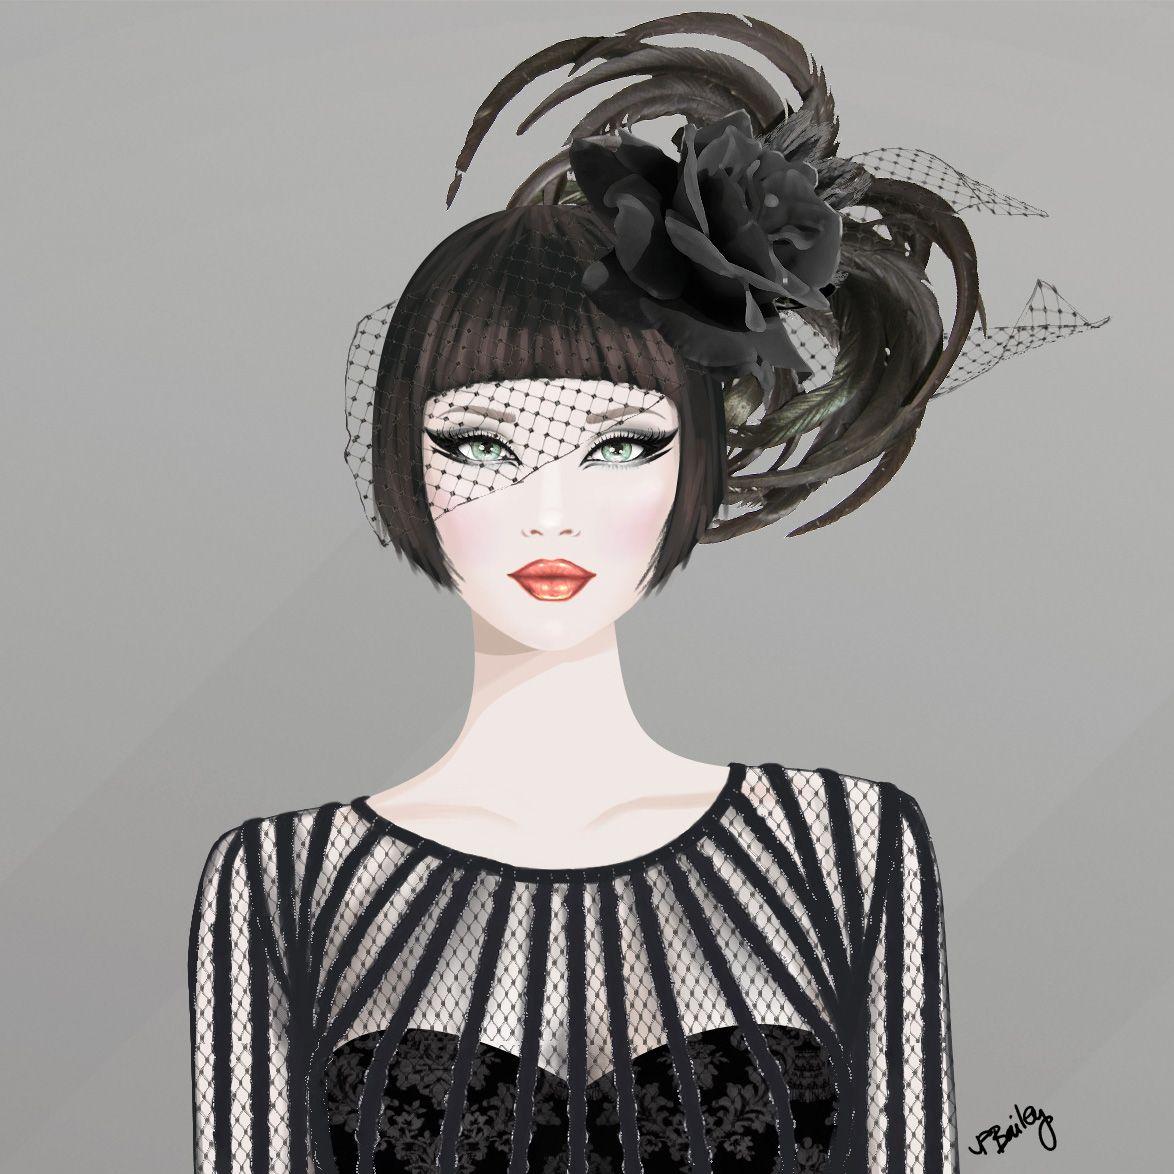 Pin On Art Illustration Inspiration 1